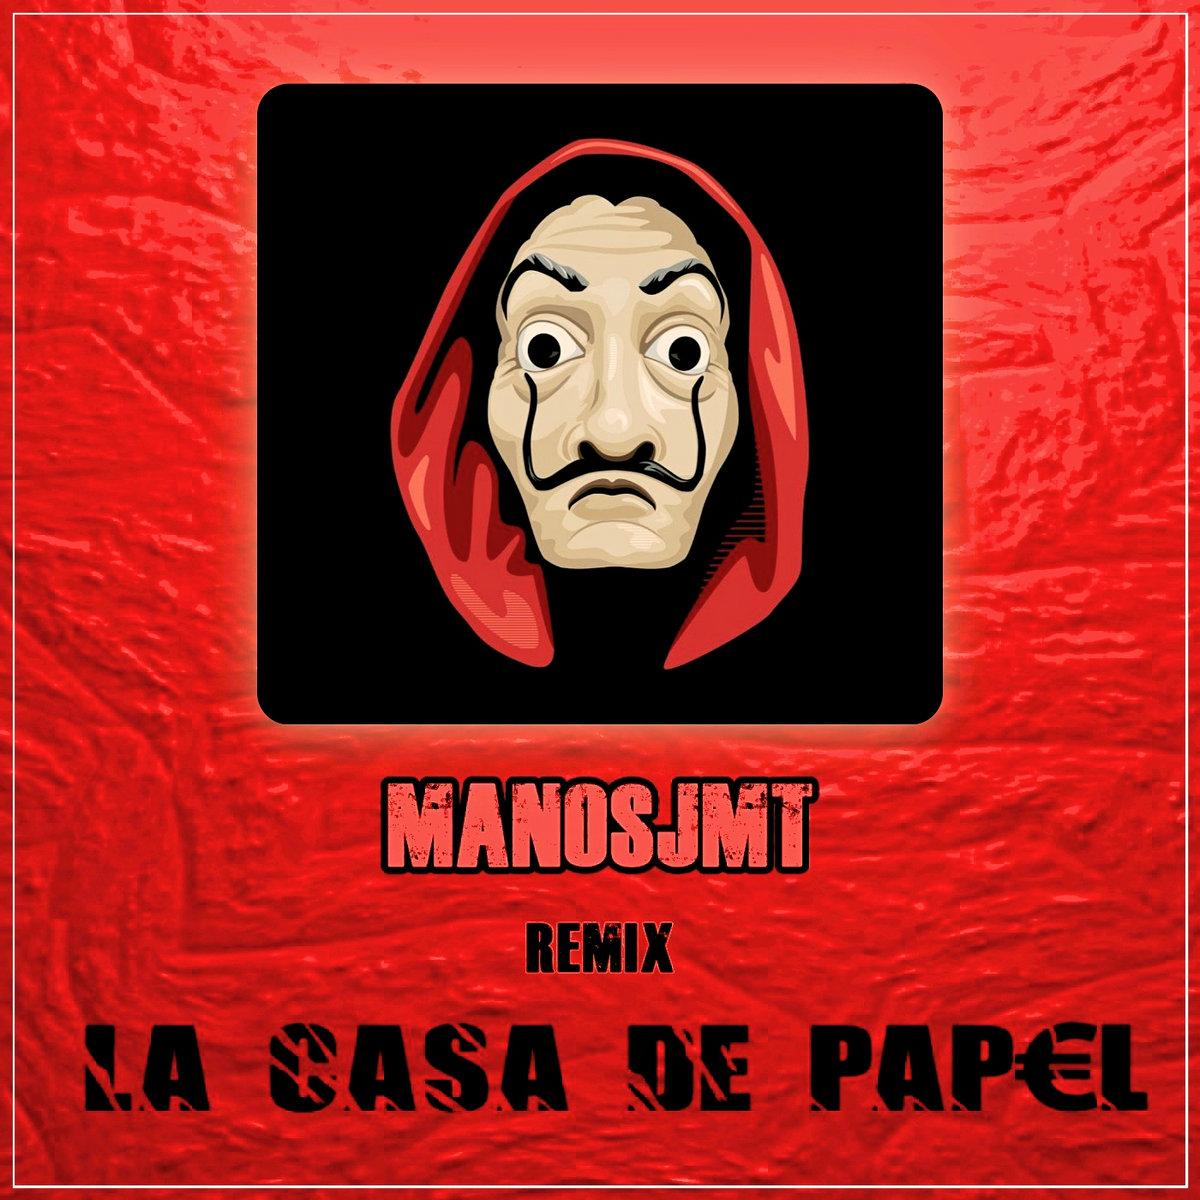 la casa de papel theme song mp3 download